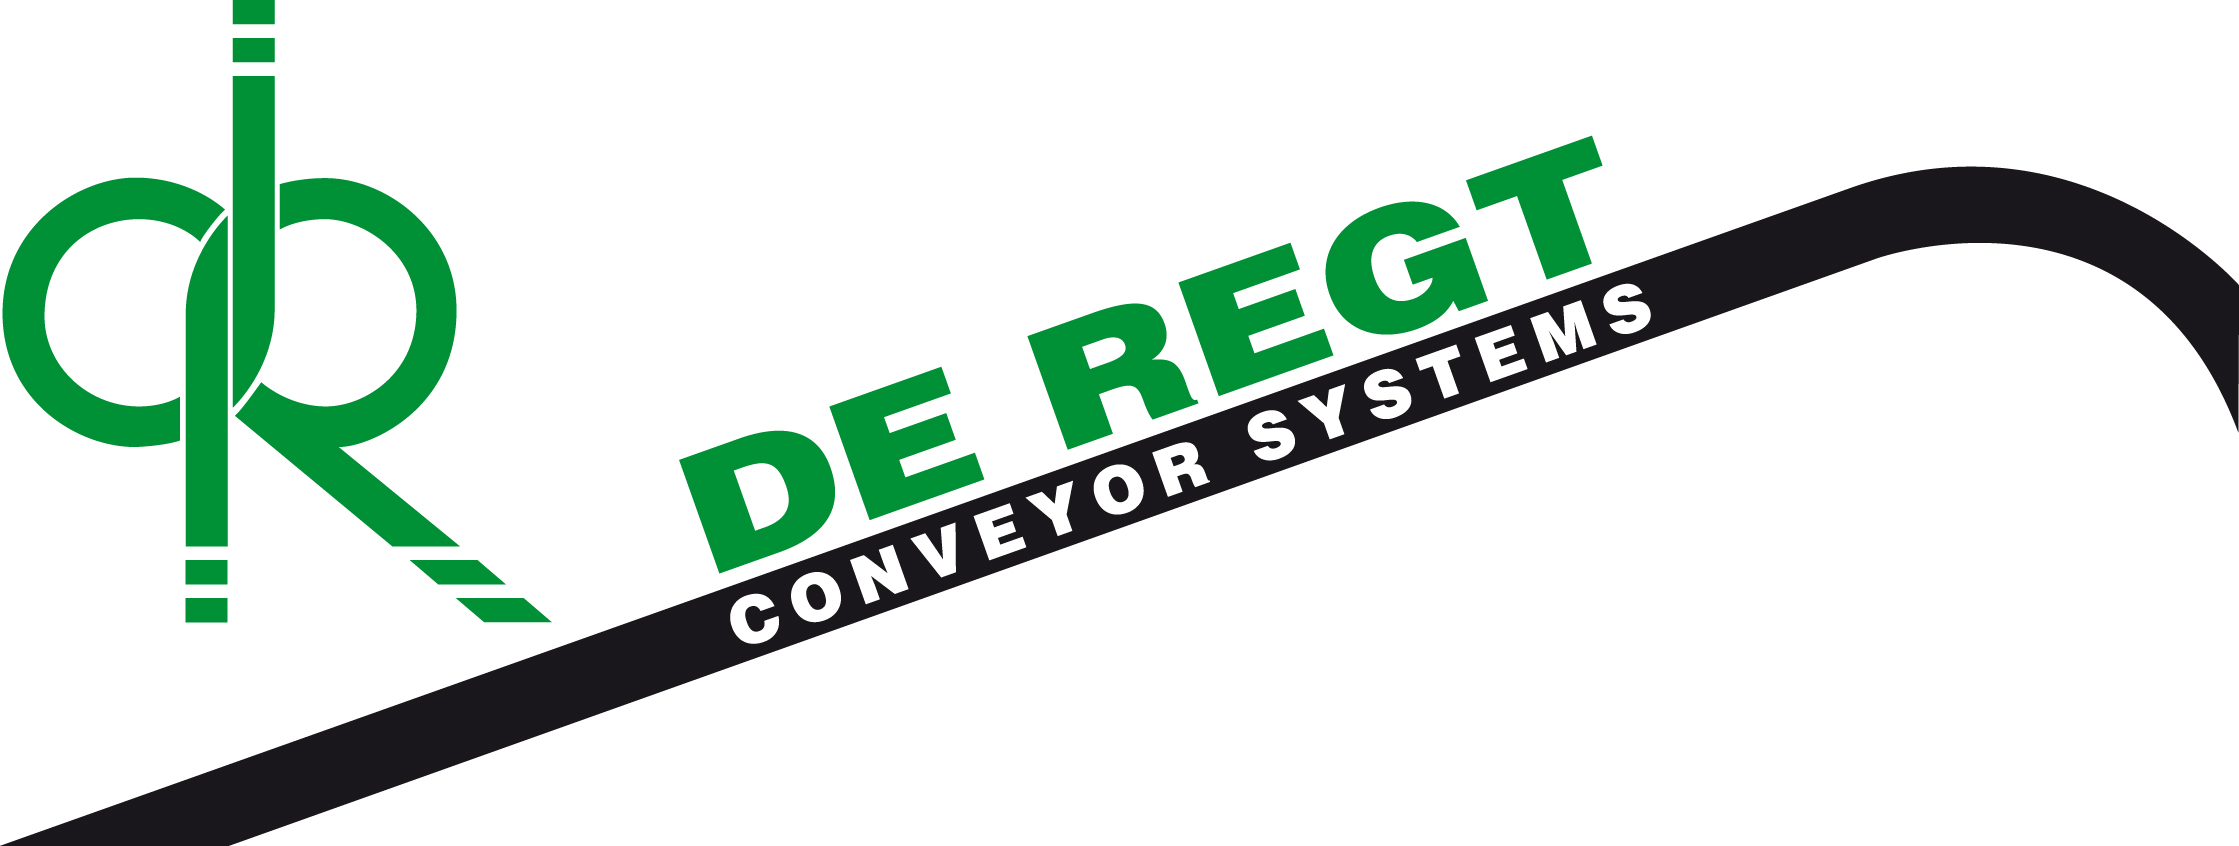 De Regt Conveyorsystems